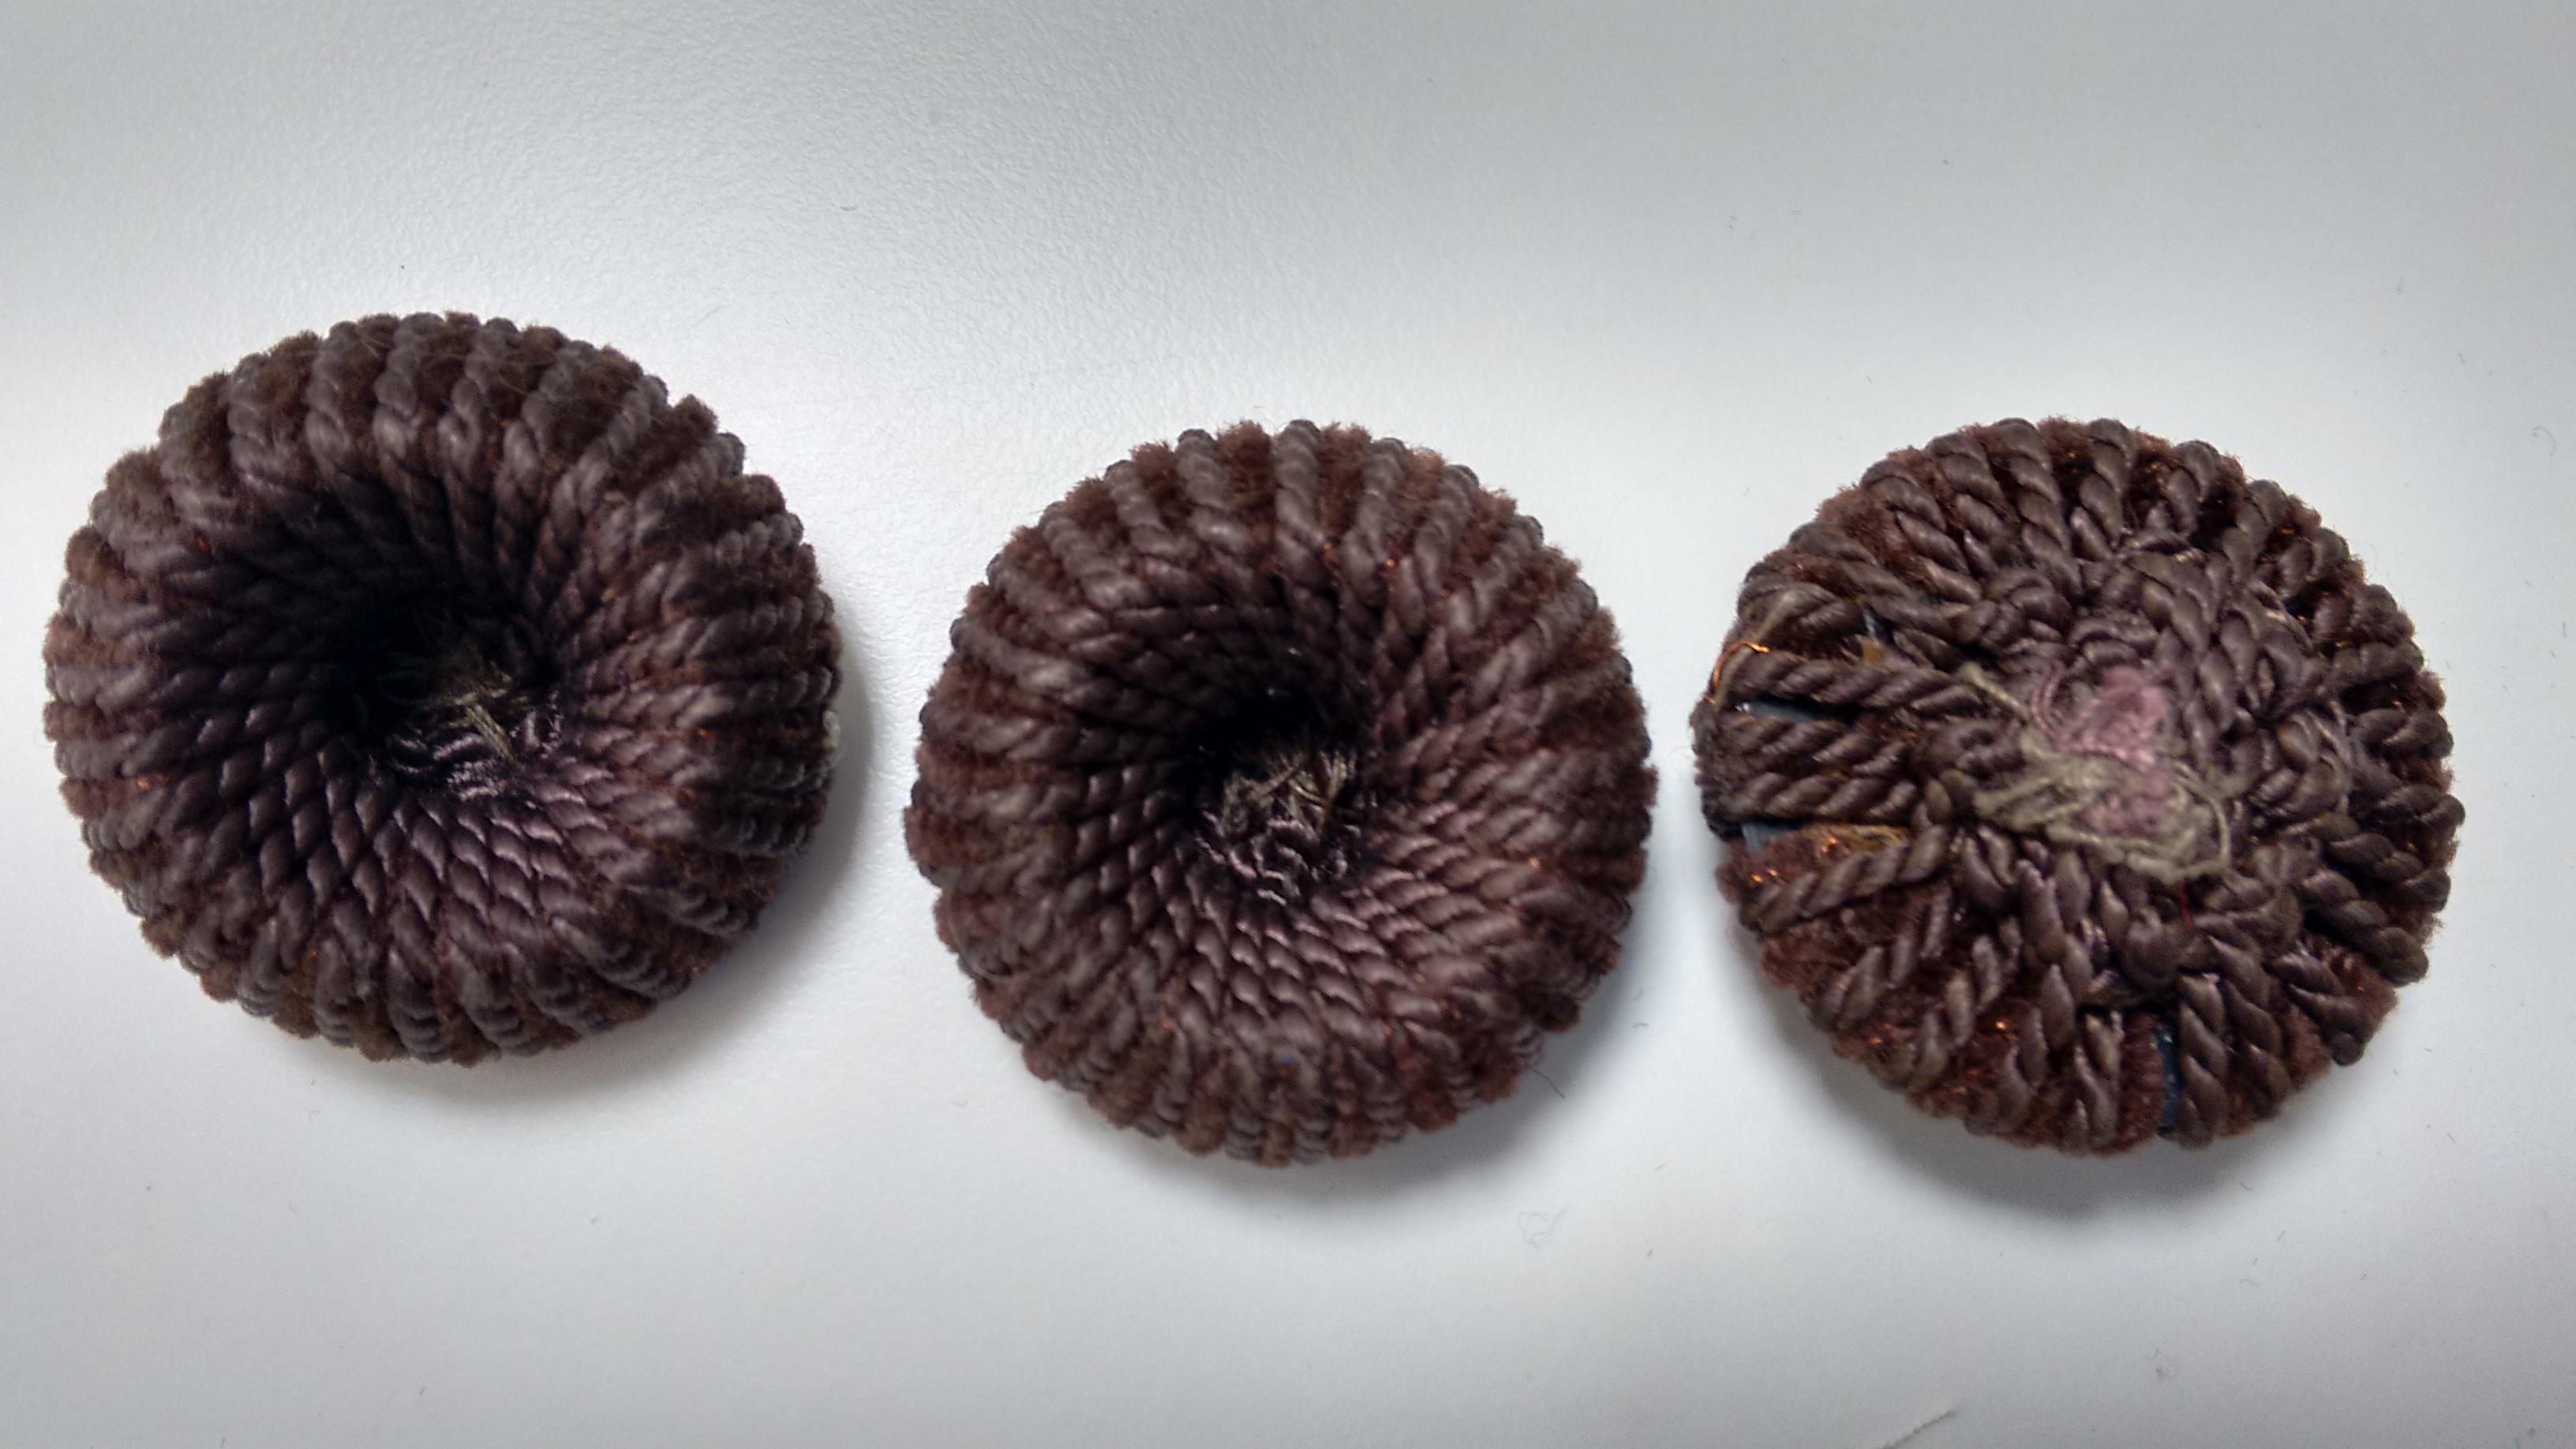 Botones  de cordoncillo marrón.